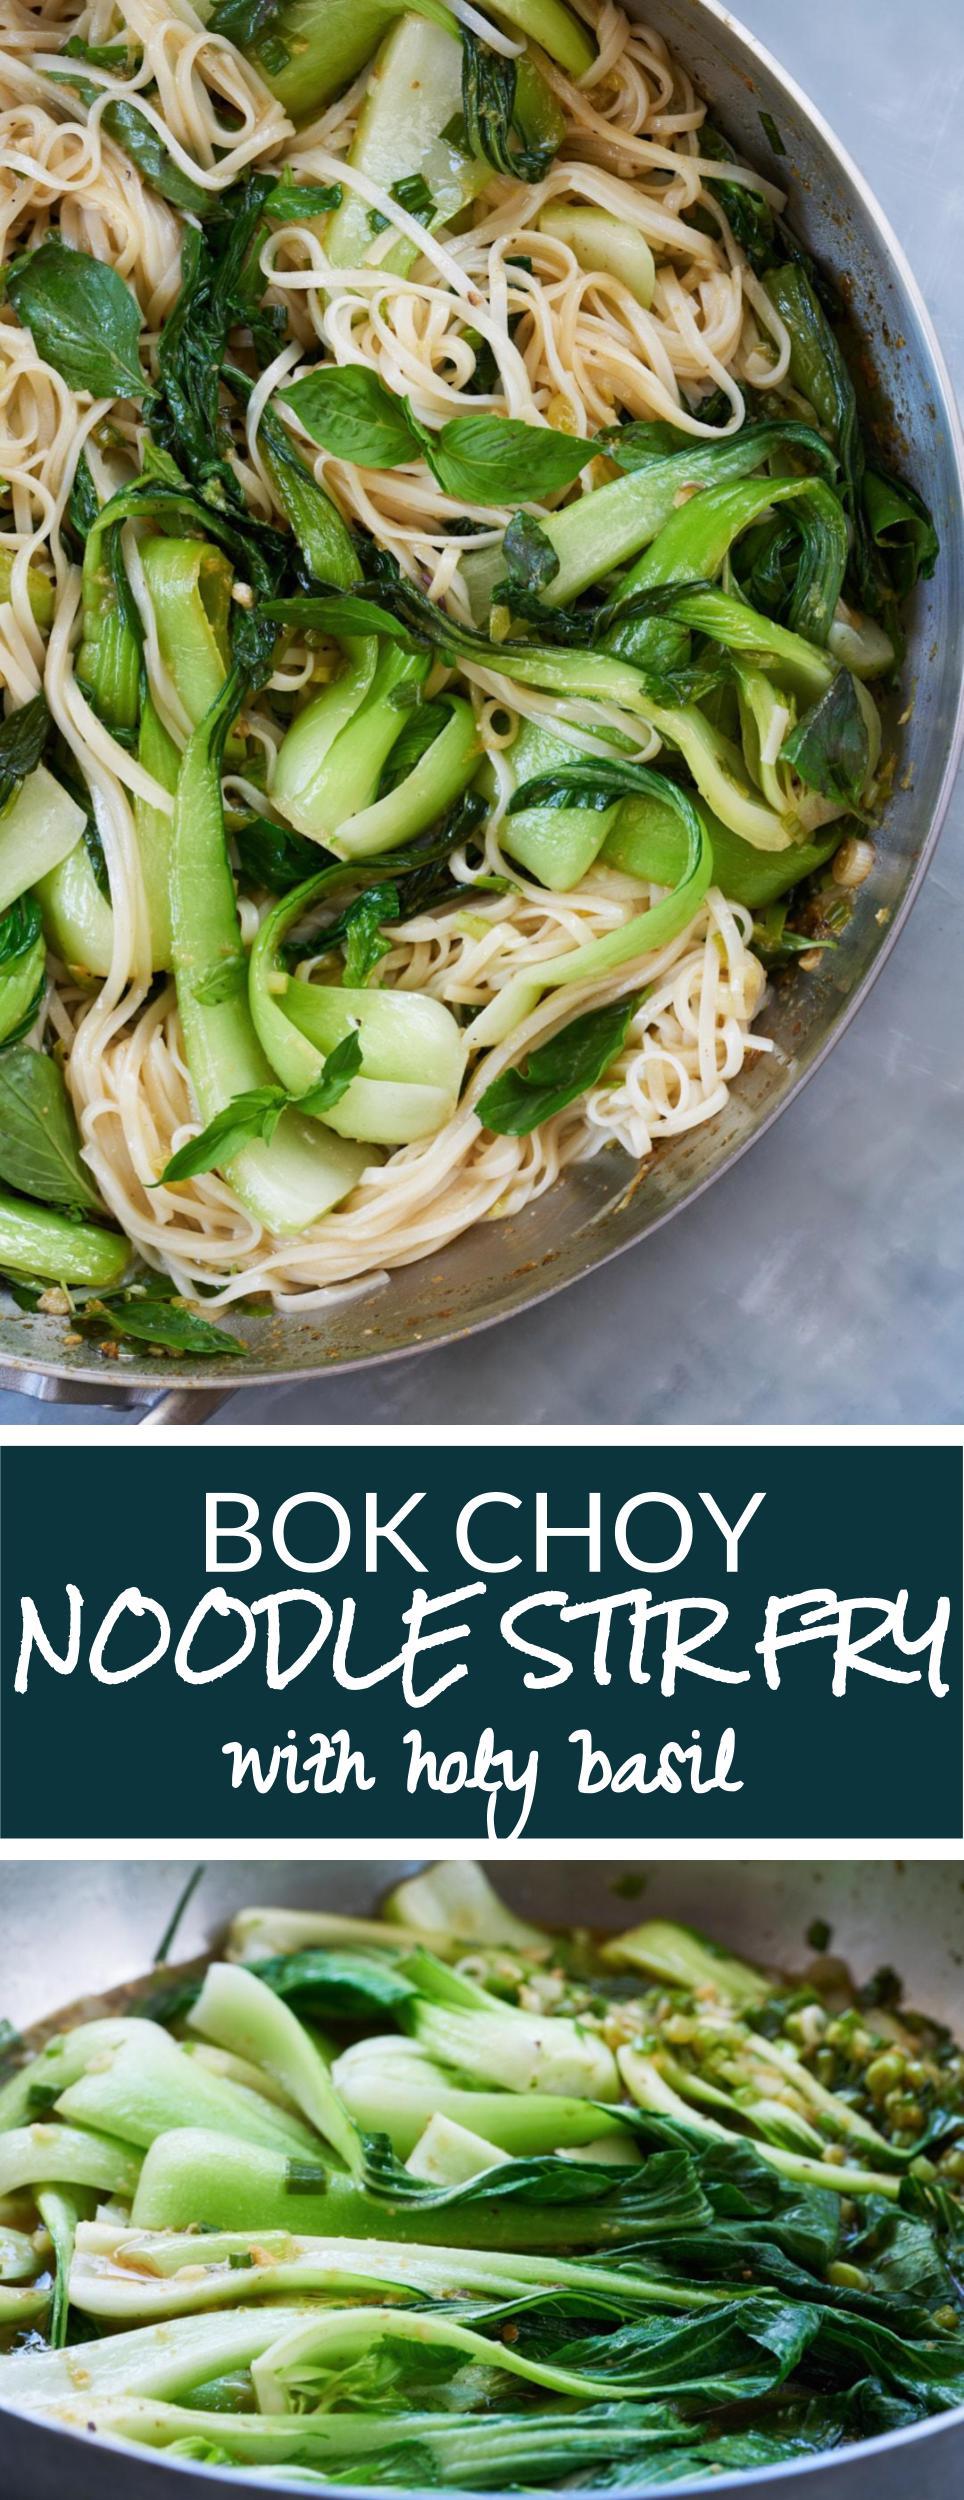 Bok Choy Noodle Stir Fry & Holy Basil   Proportional Plate